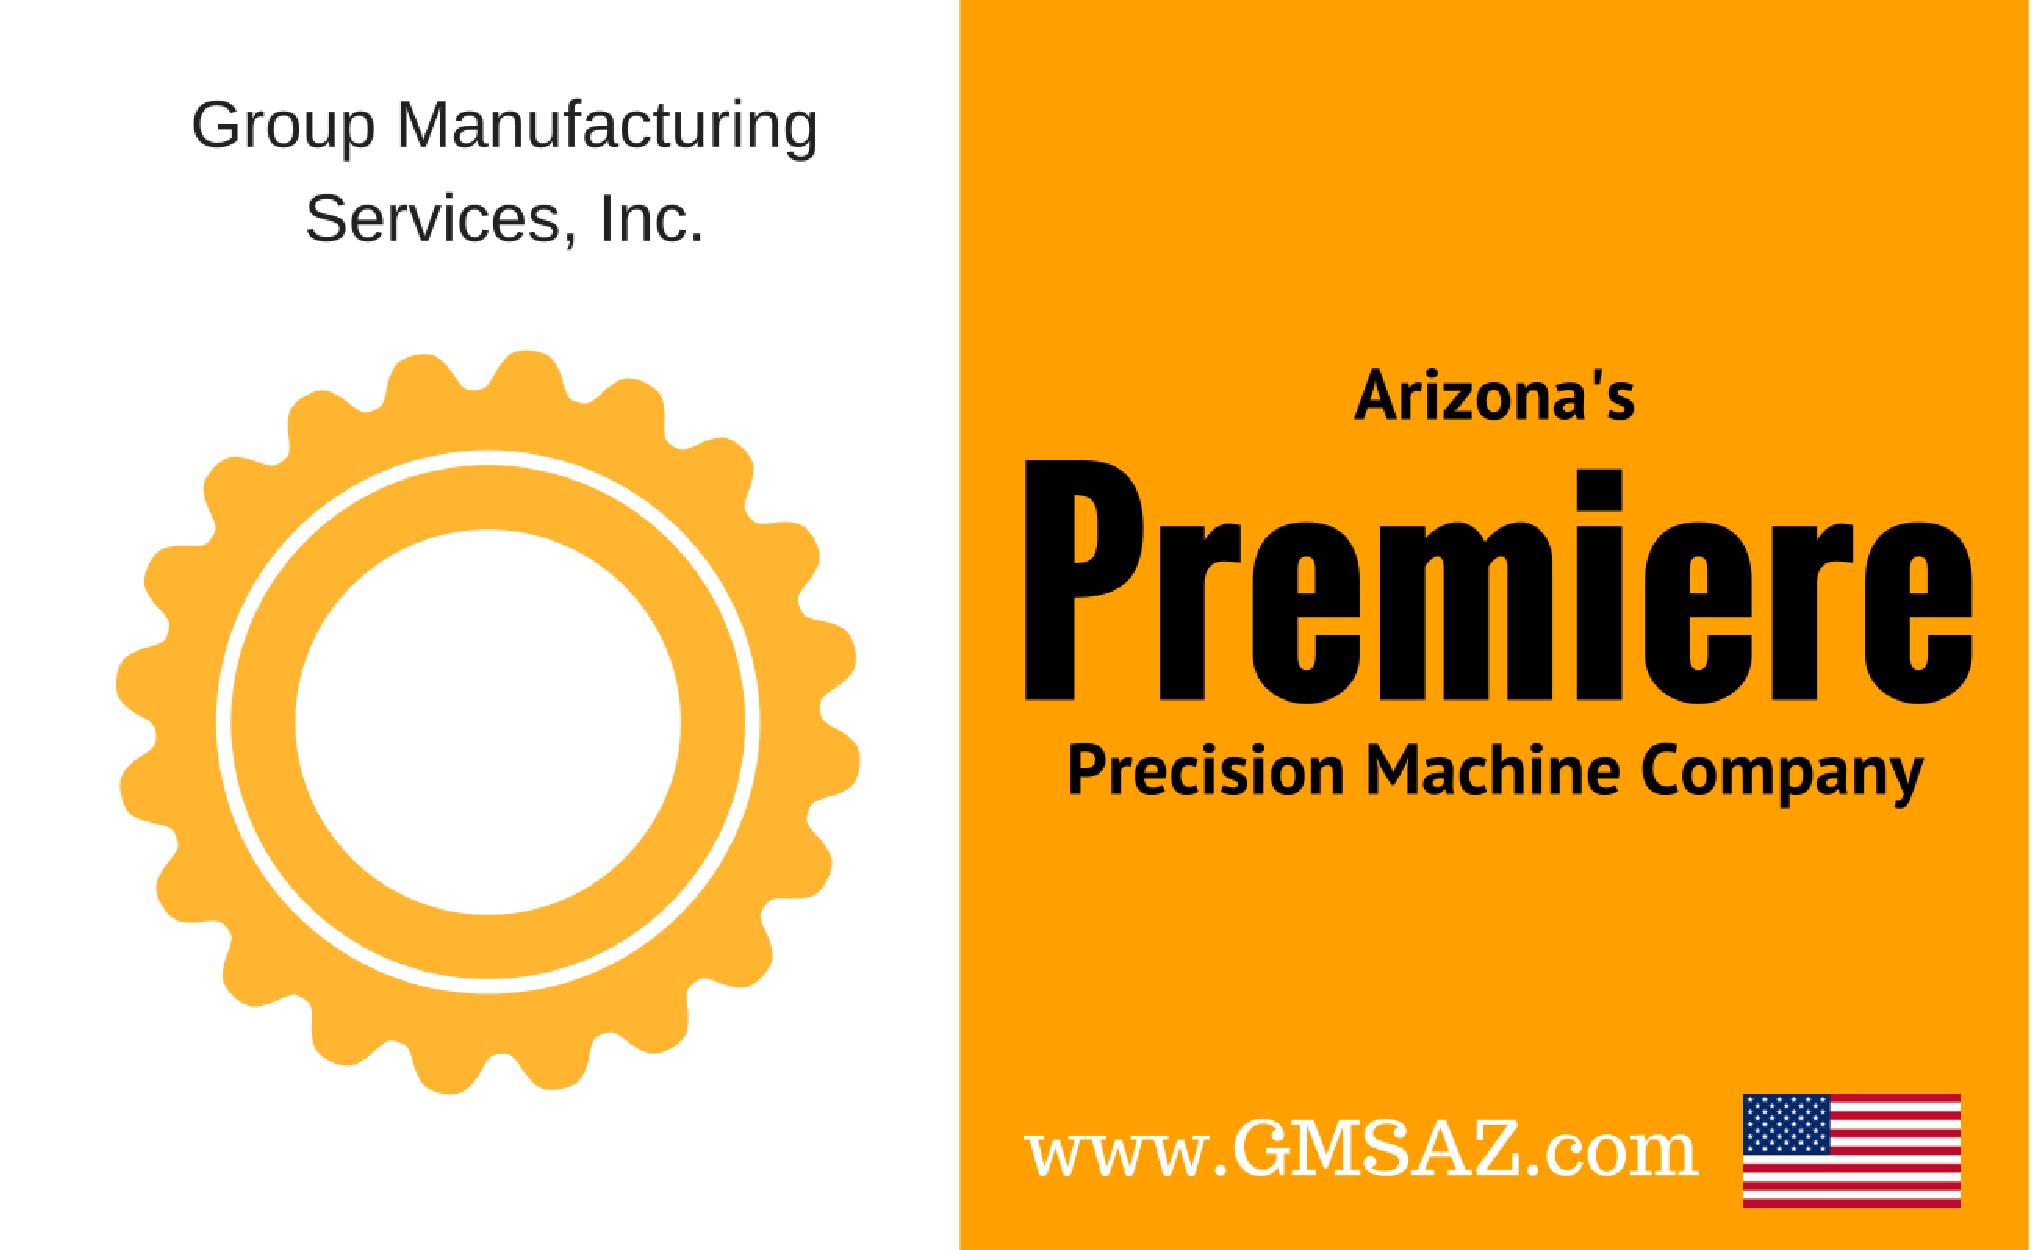 Precision Machining Company | Group Manufacturing Services, Inc. | Tempe, AZ